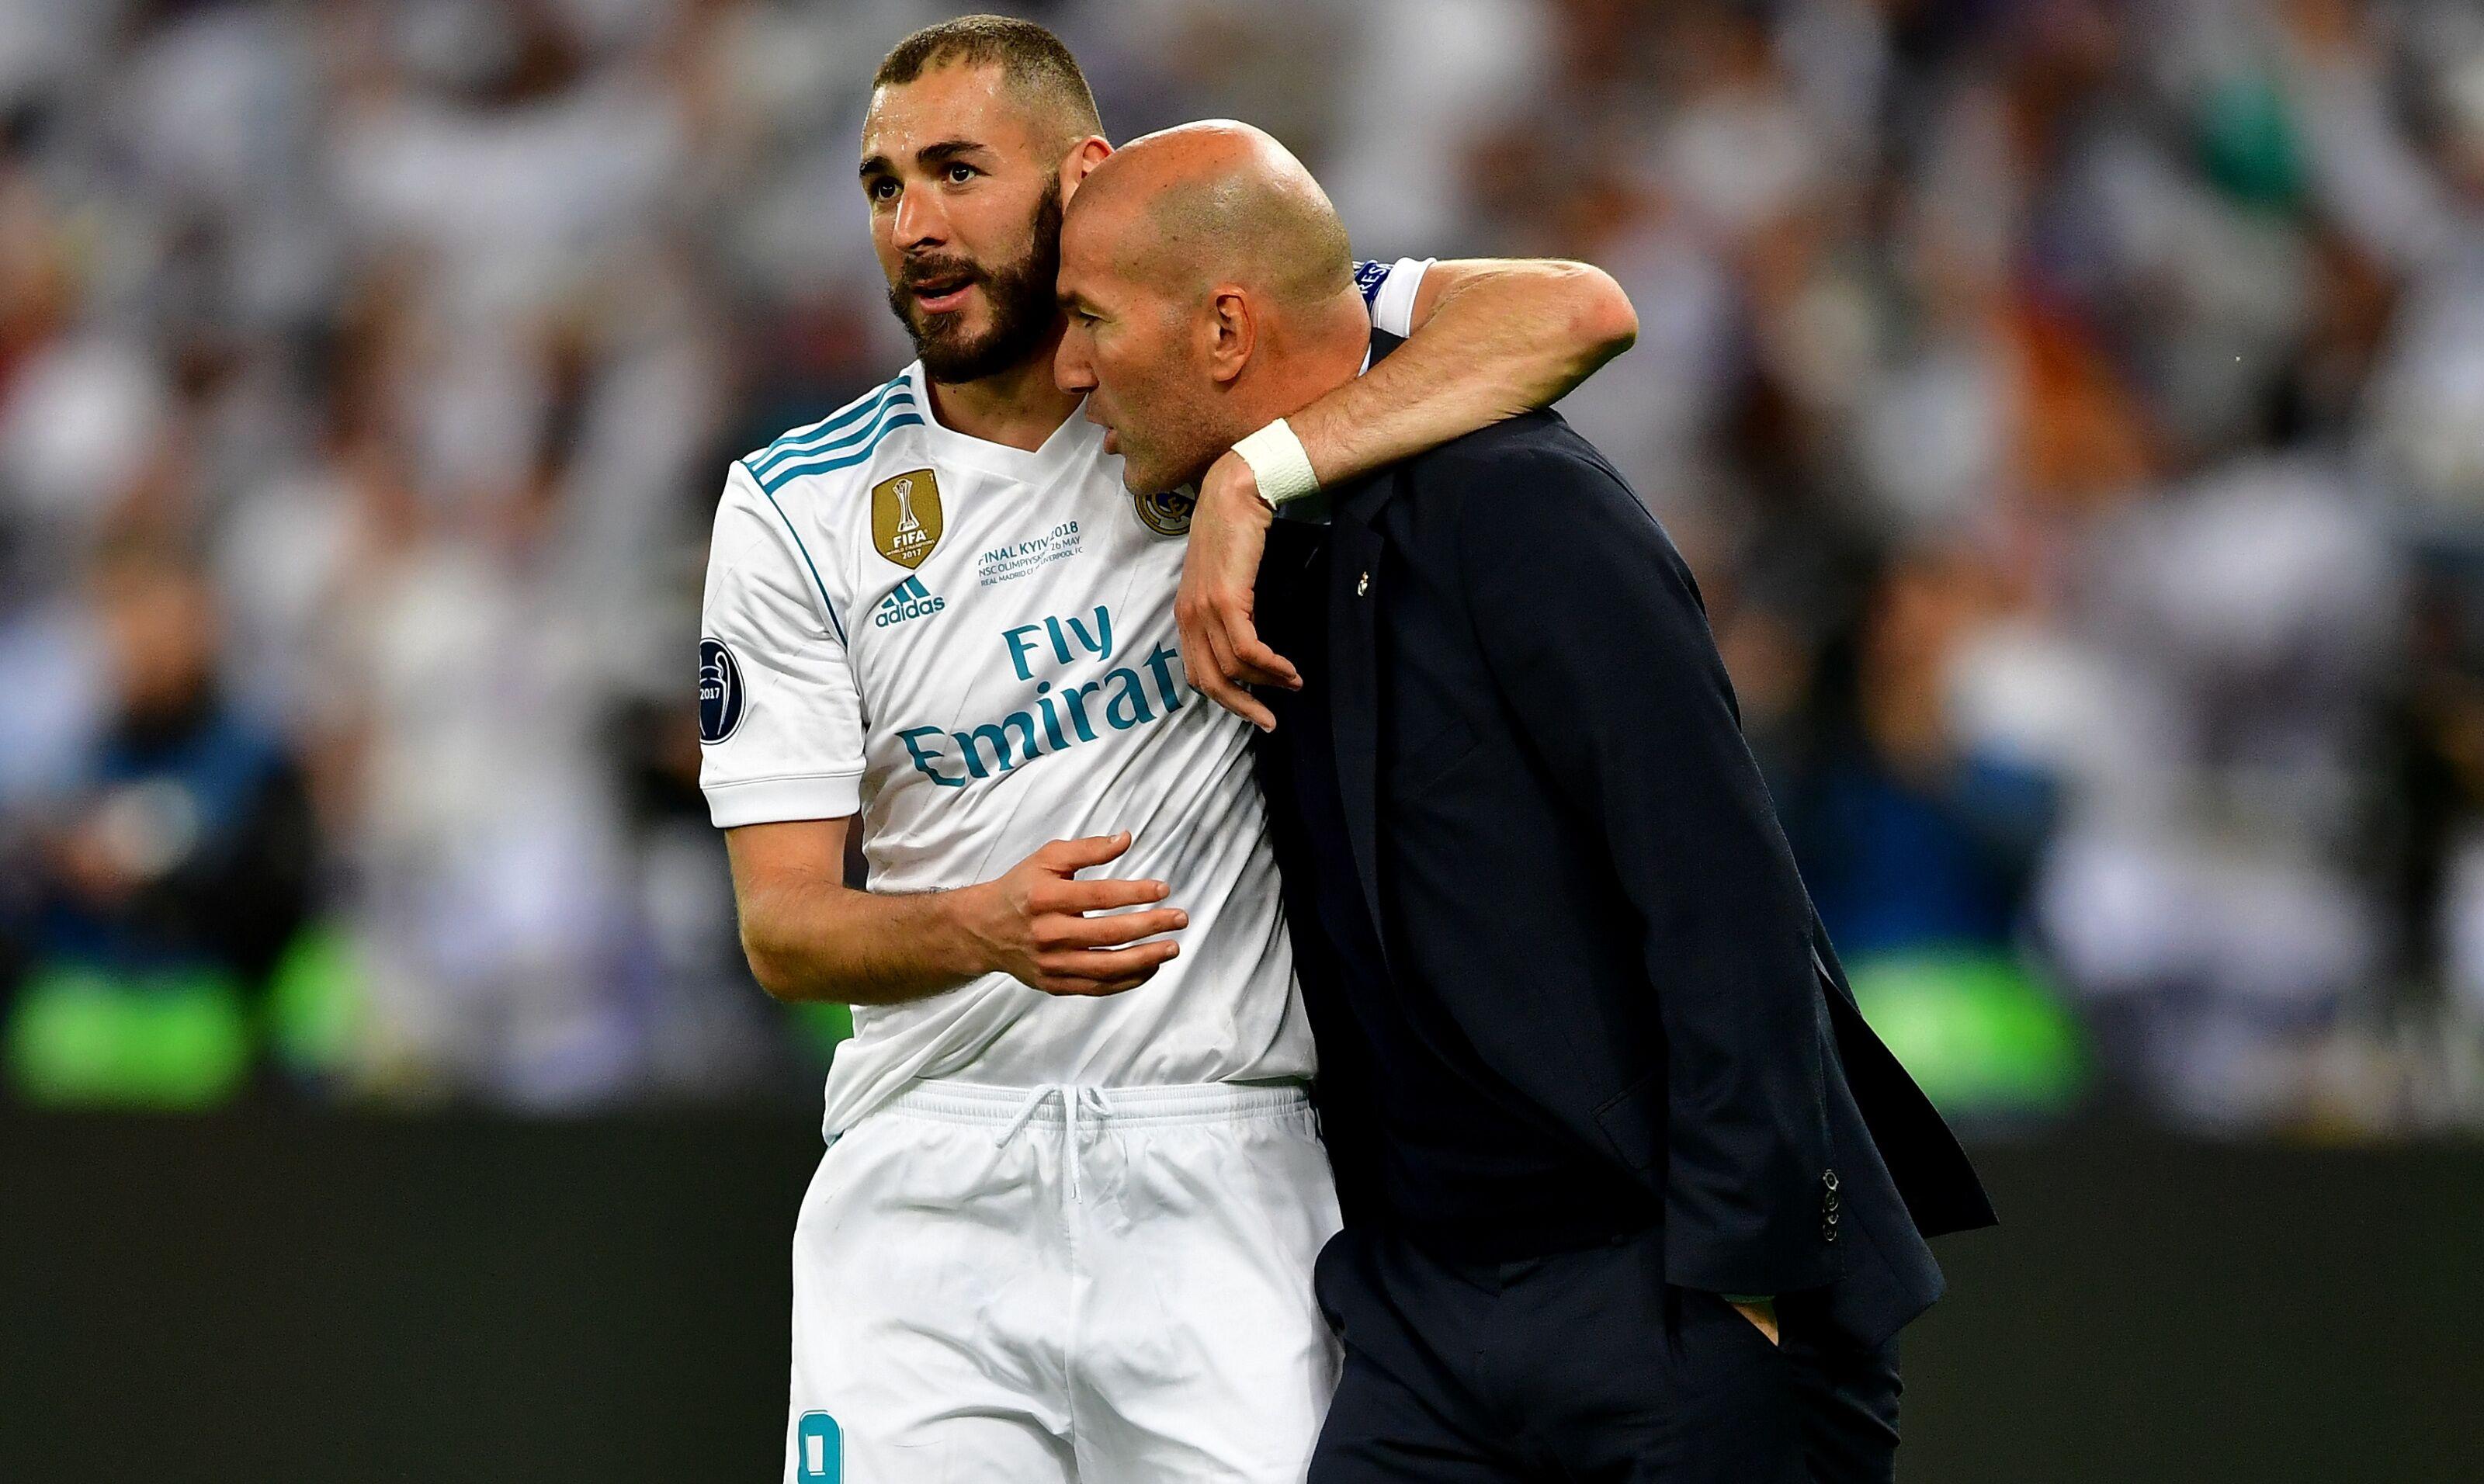 Real Madrid: Karim Benzema and Zinedine Zidane next season's strike options